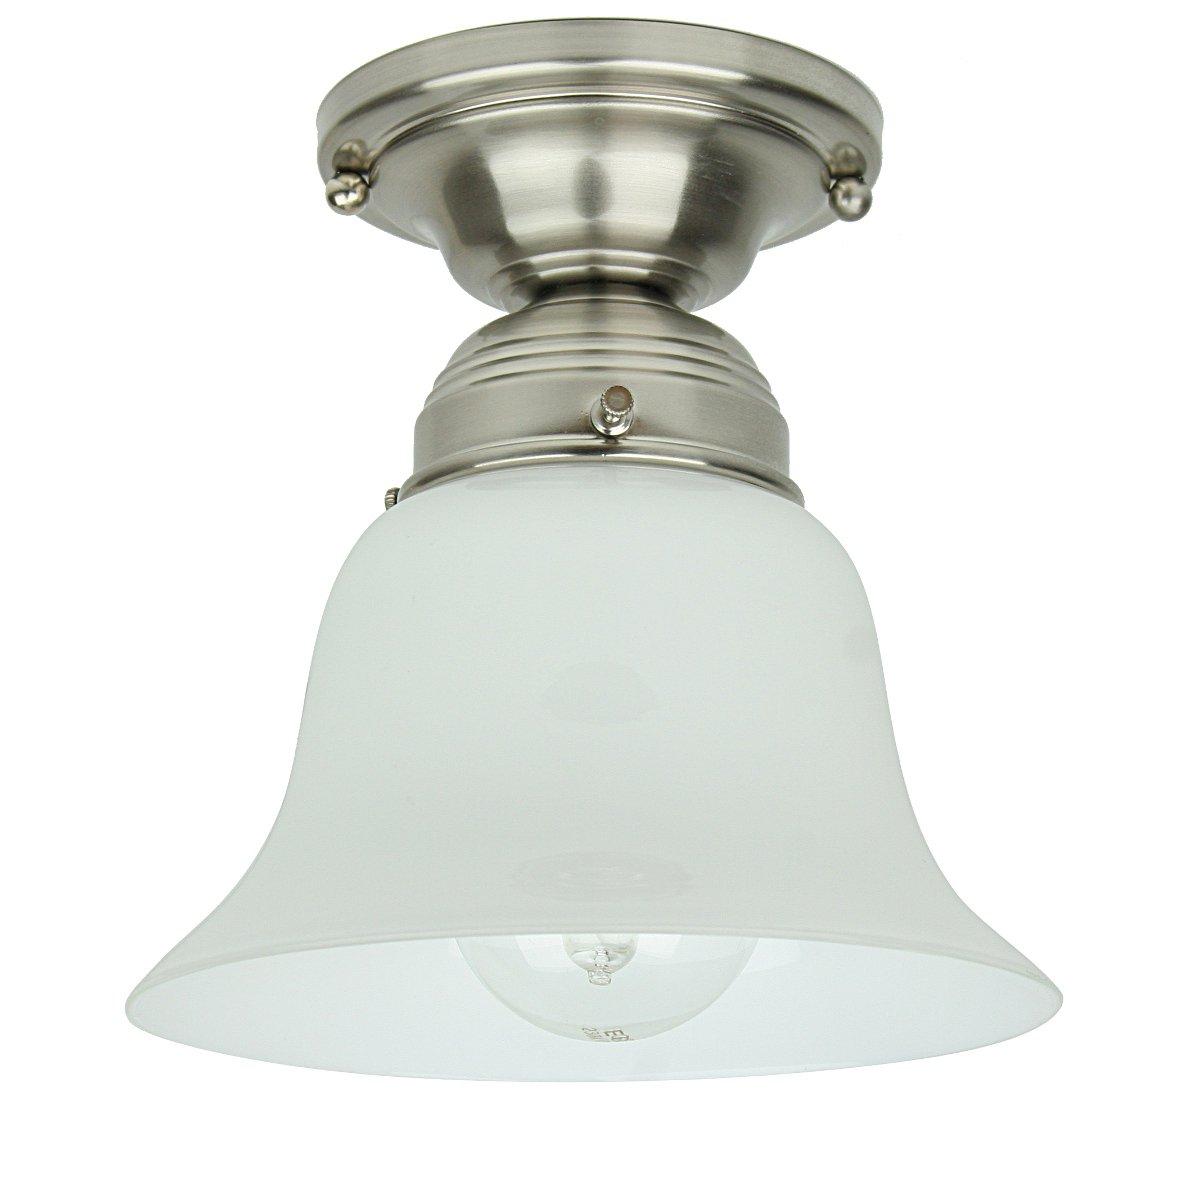 smilla klassische deckenlampe mit verschiedenen. Black Bedroom Furniture Sets. Home Design Ideas